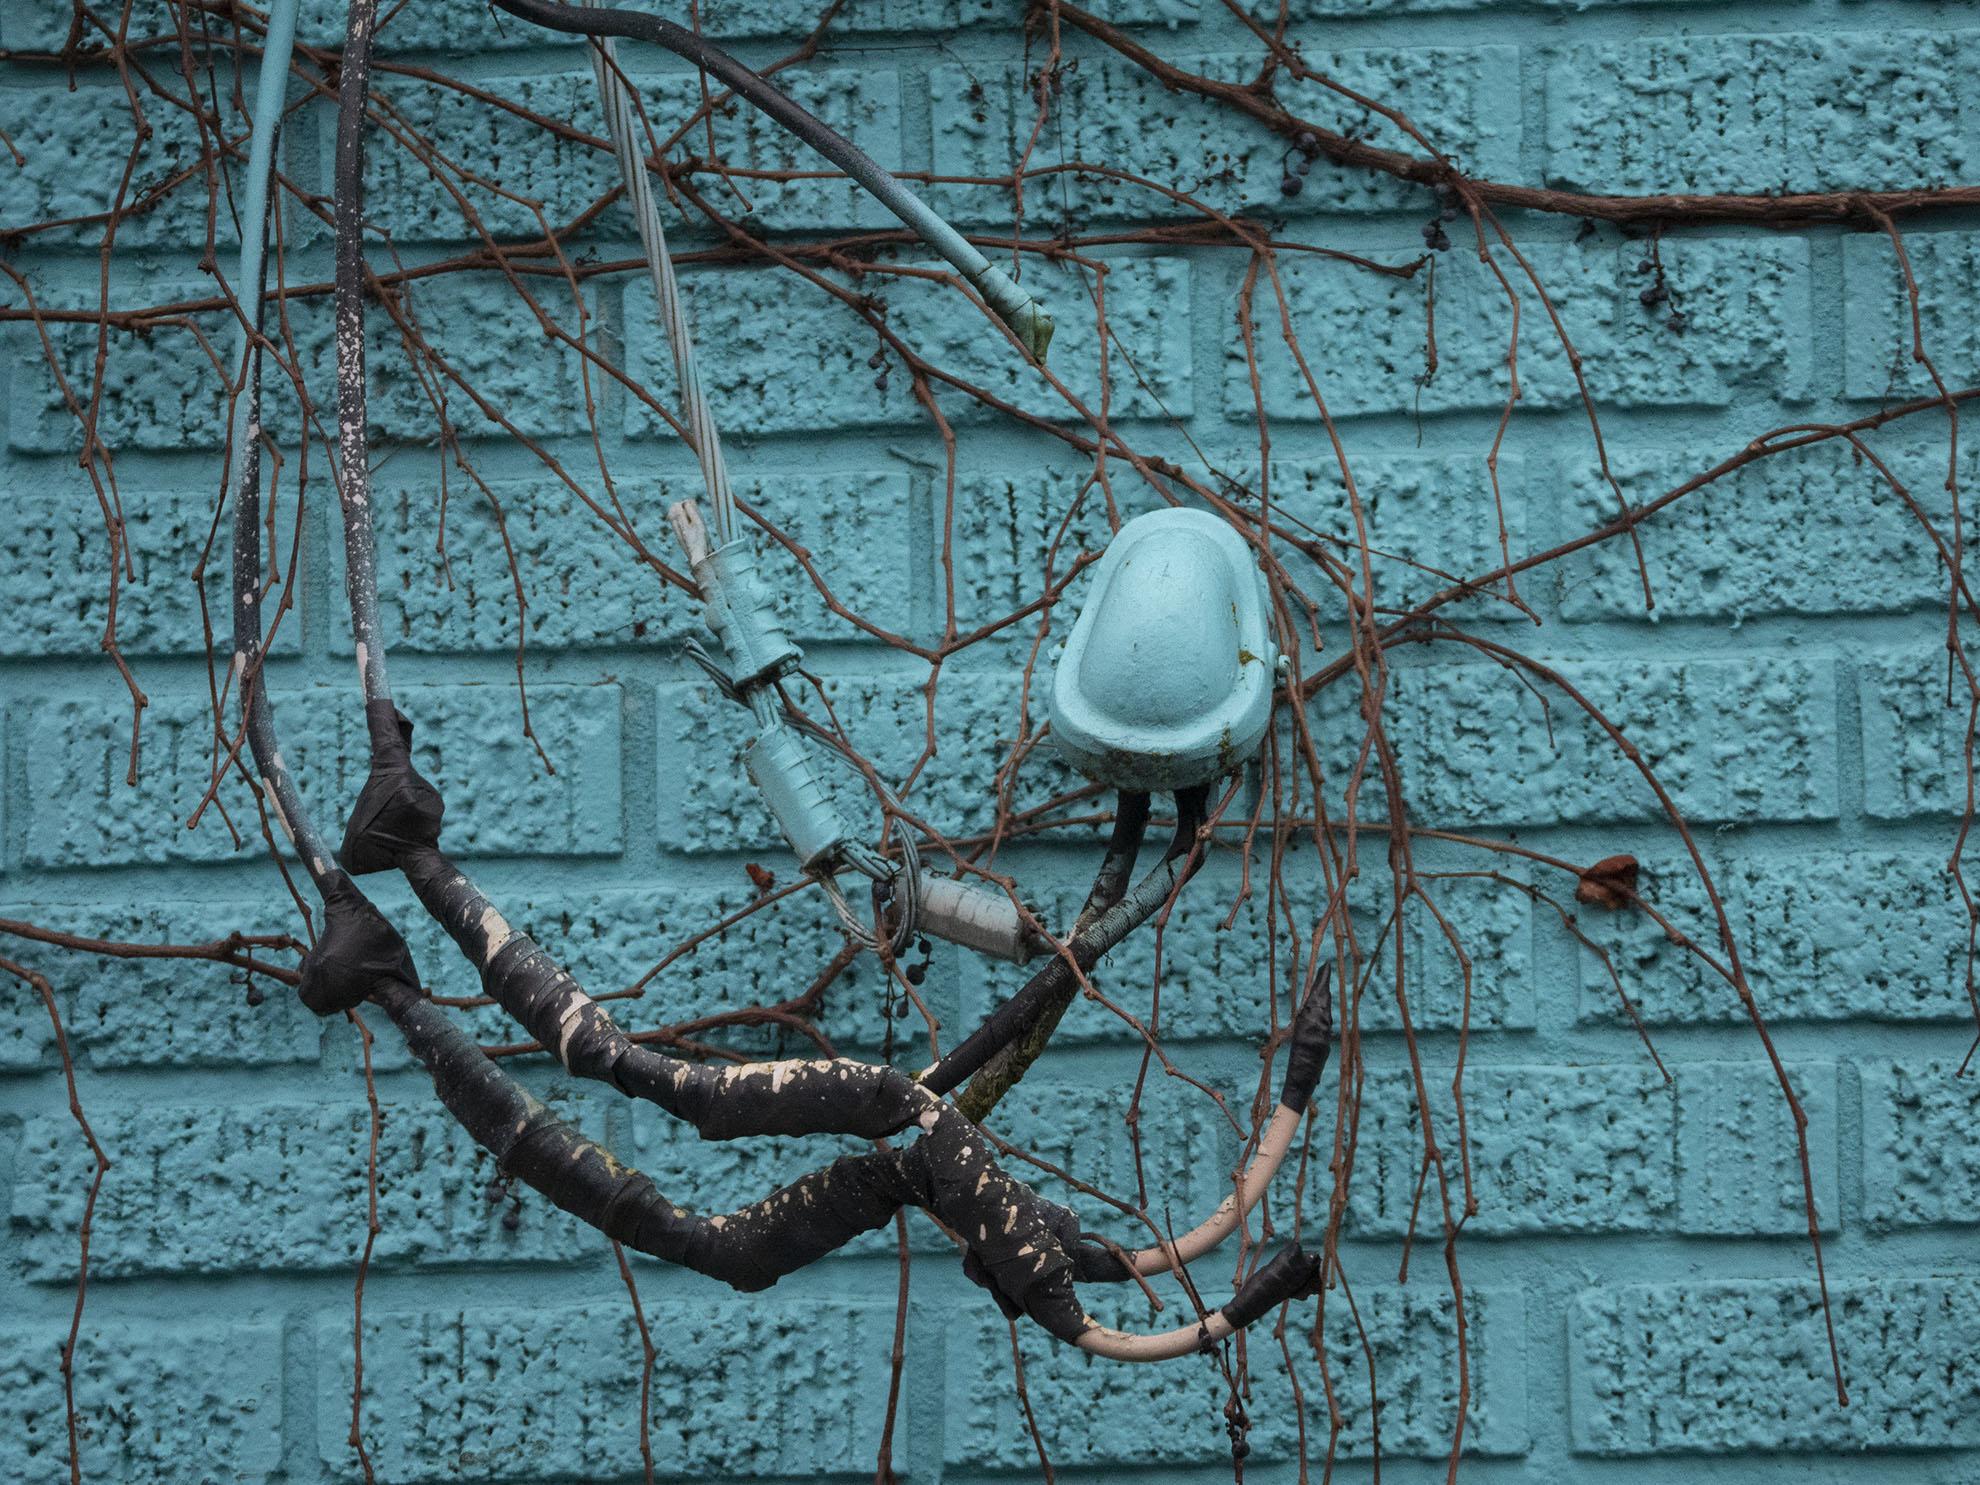 Vines-Wires